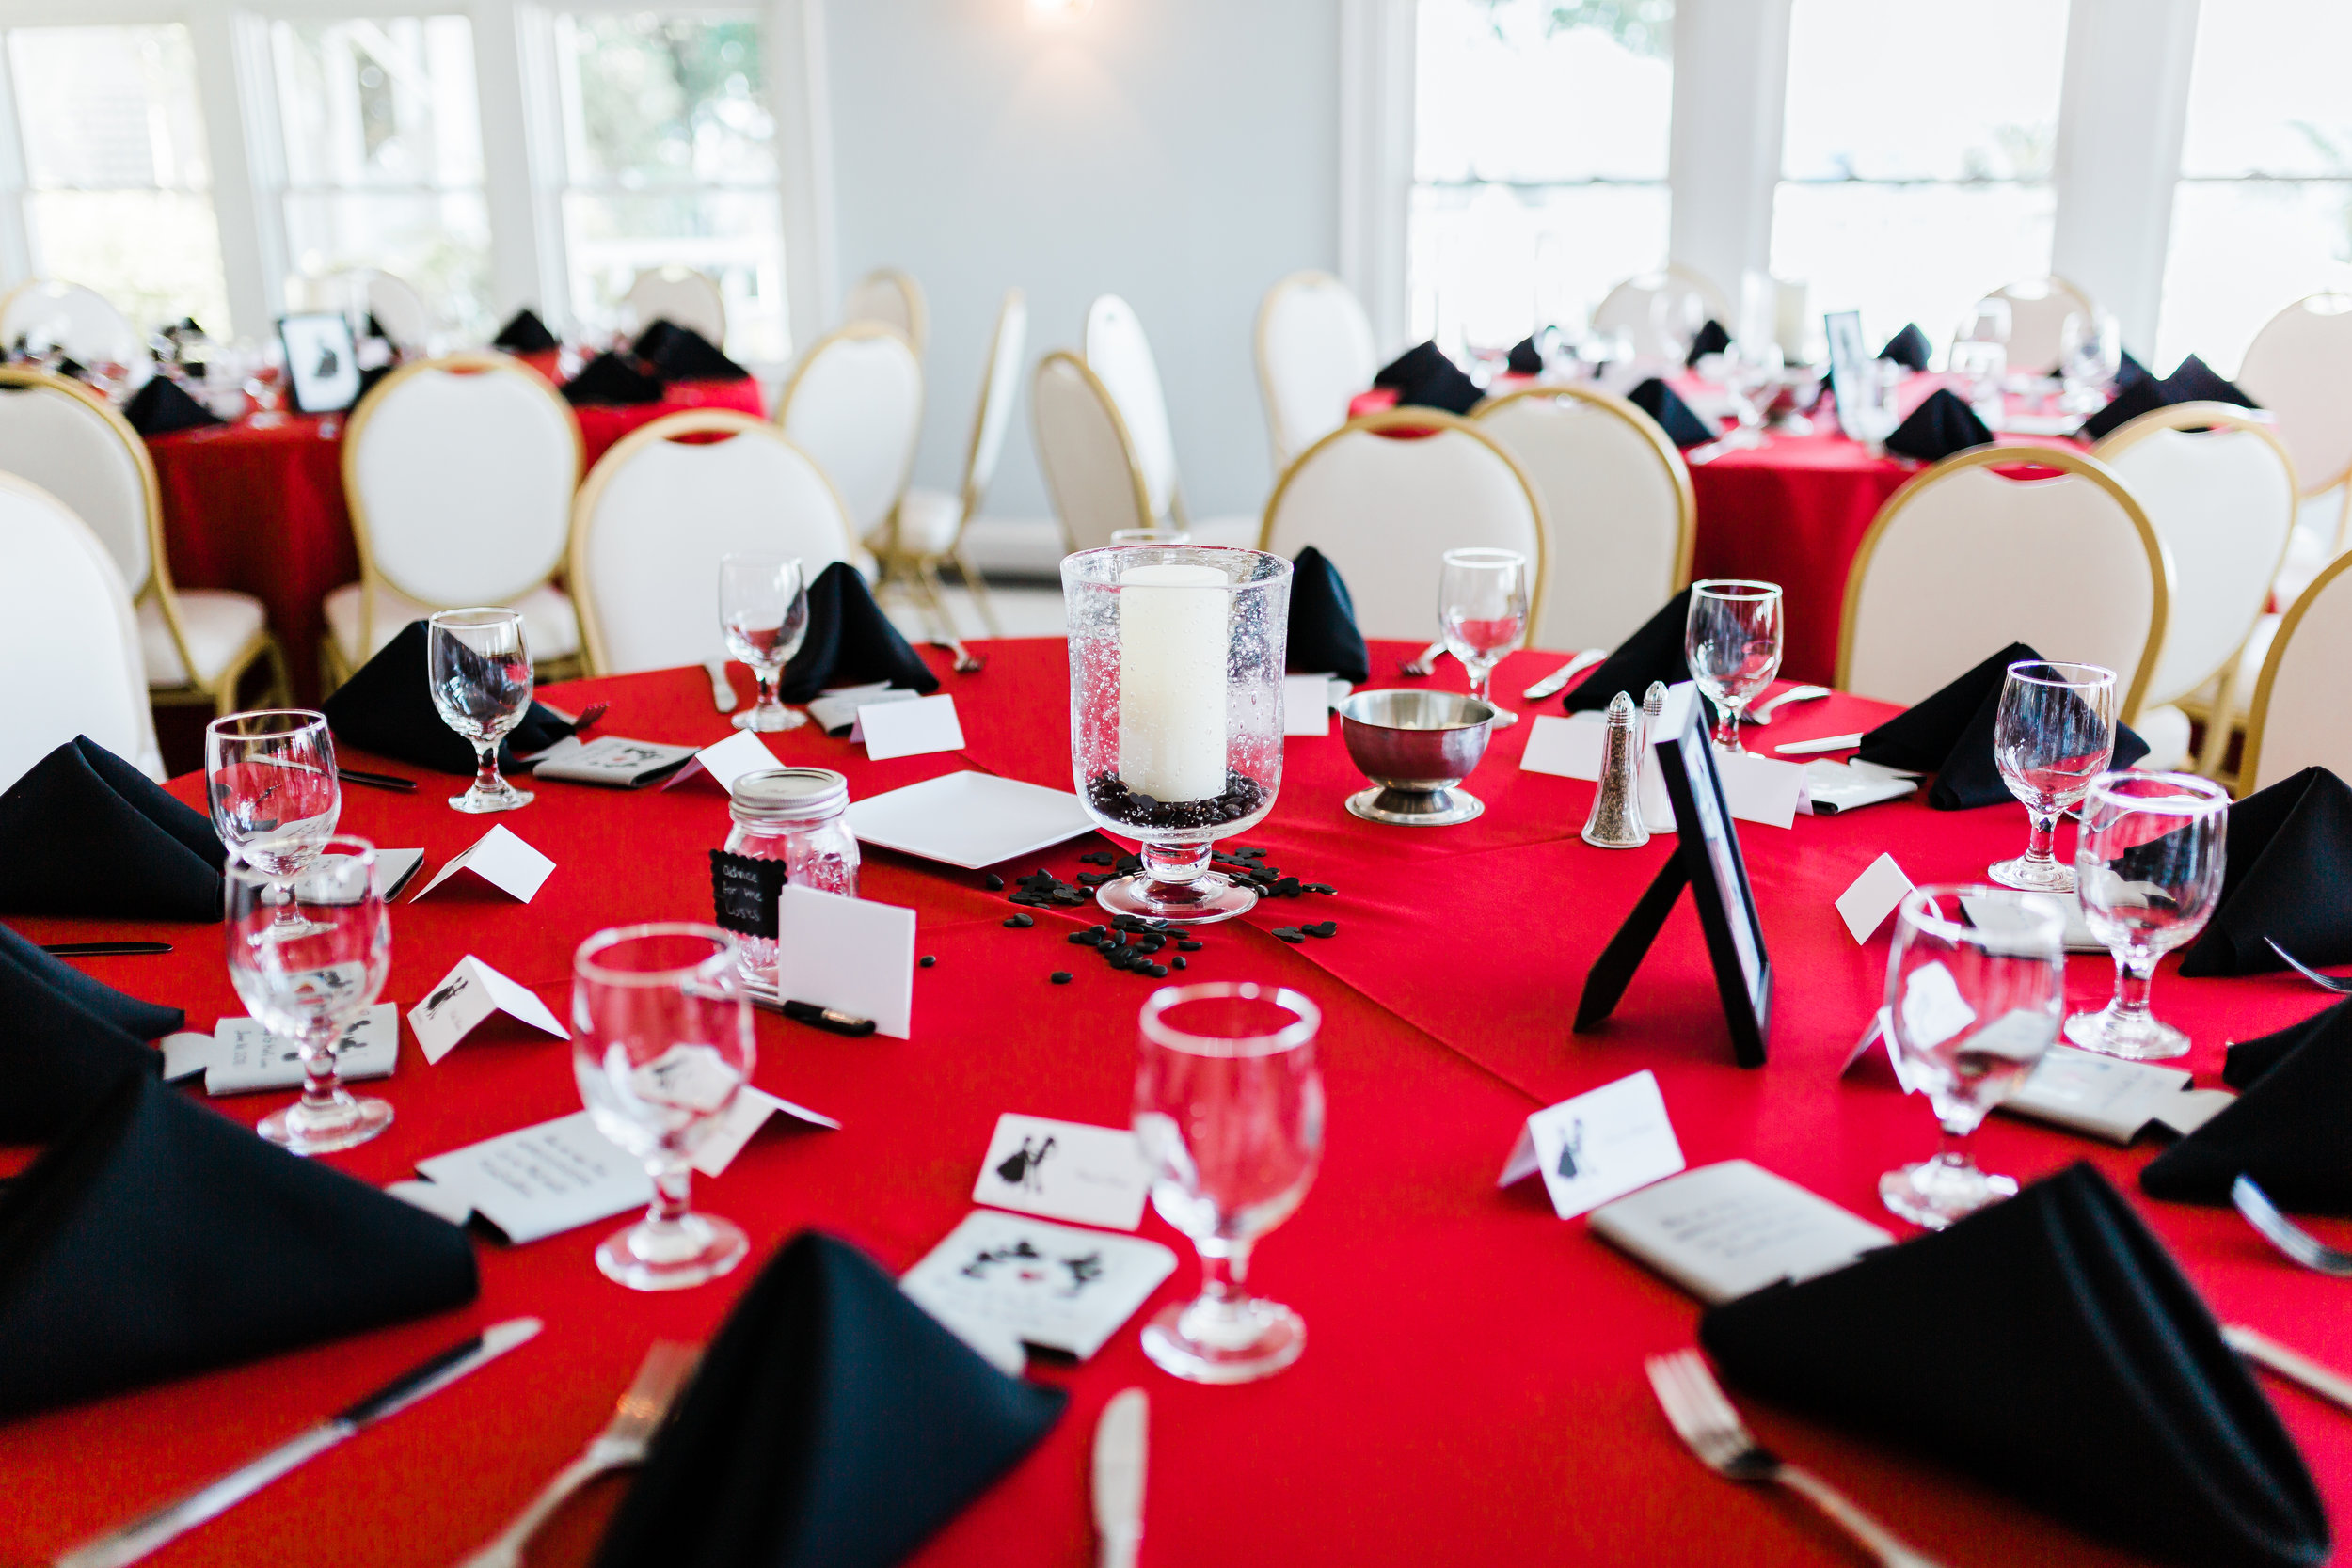 wedding reception at kurtz's beach in pasadena, md - maryland wedding photographer - disney wedding inspiration